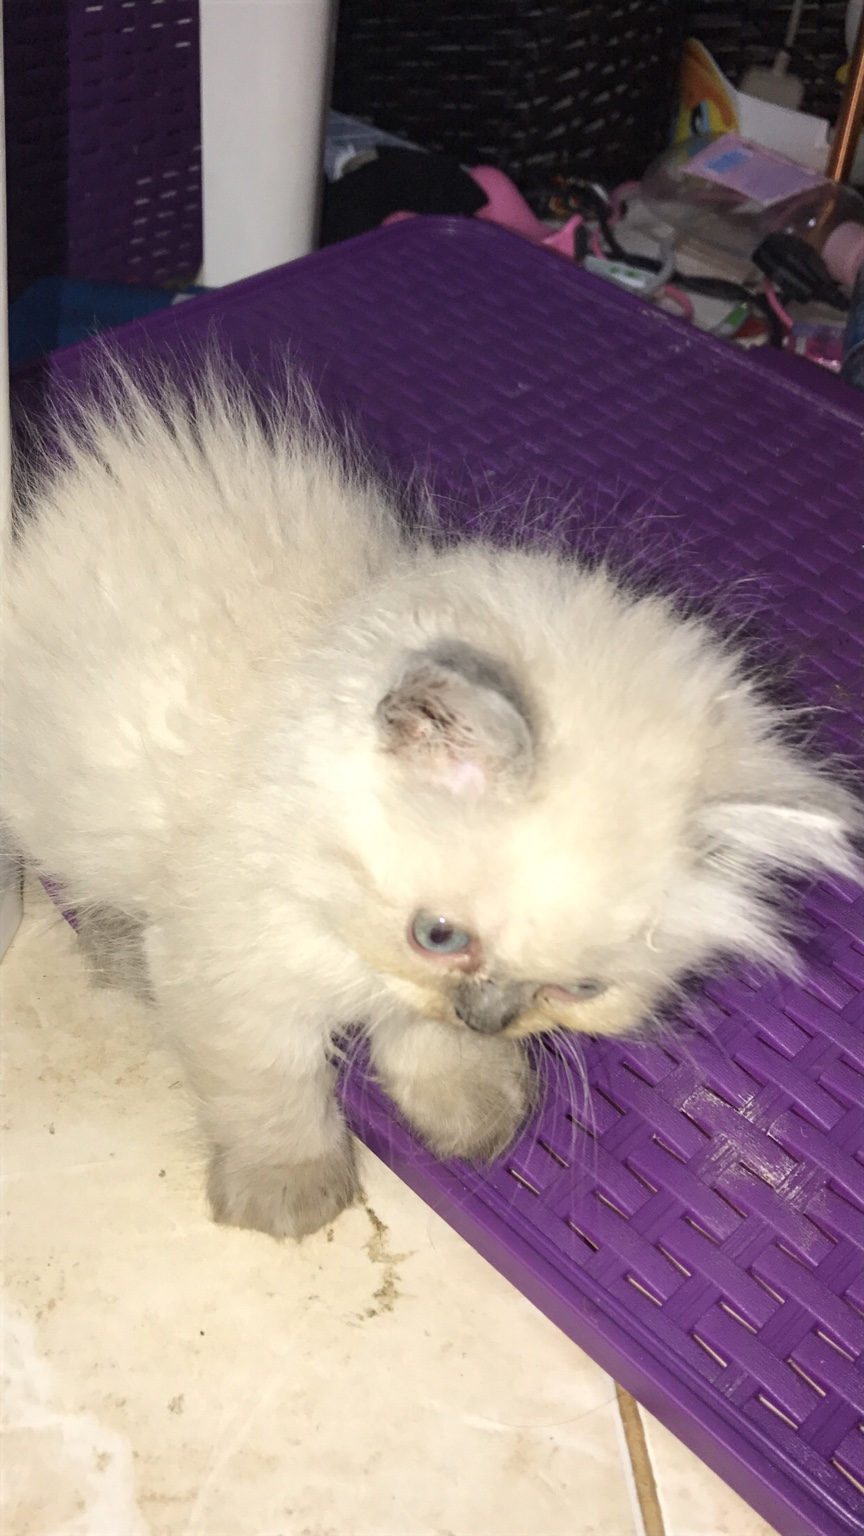 للبيع قطط هملايا بيكي فيس عمر شهرين للبيع 2021 7b3fa369e71d24198979e62e11b1f66c